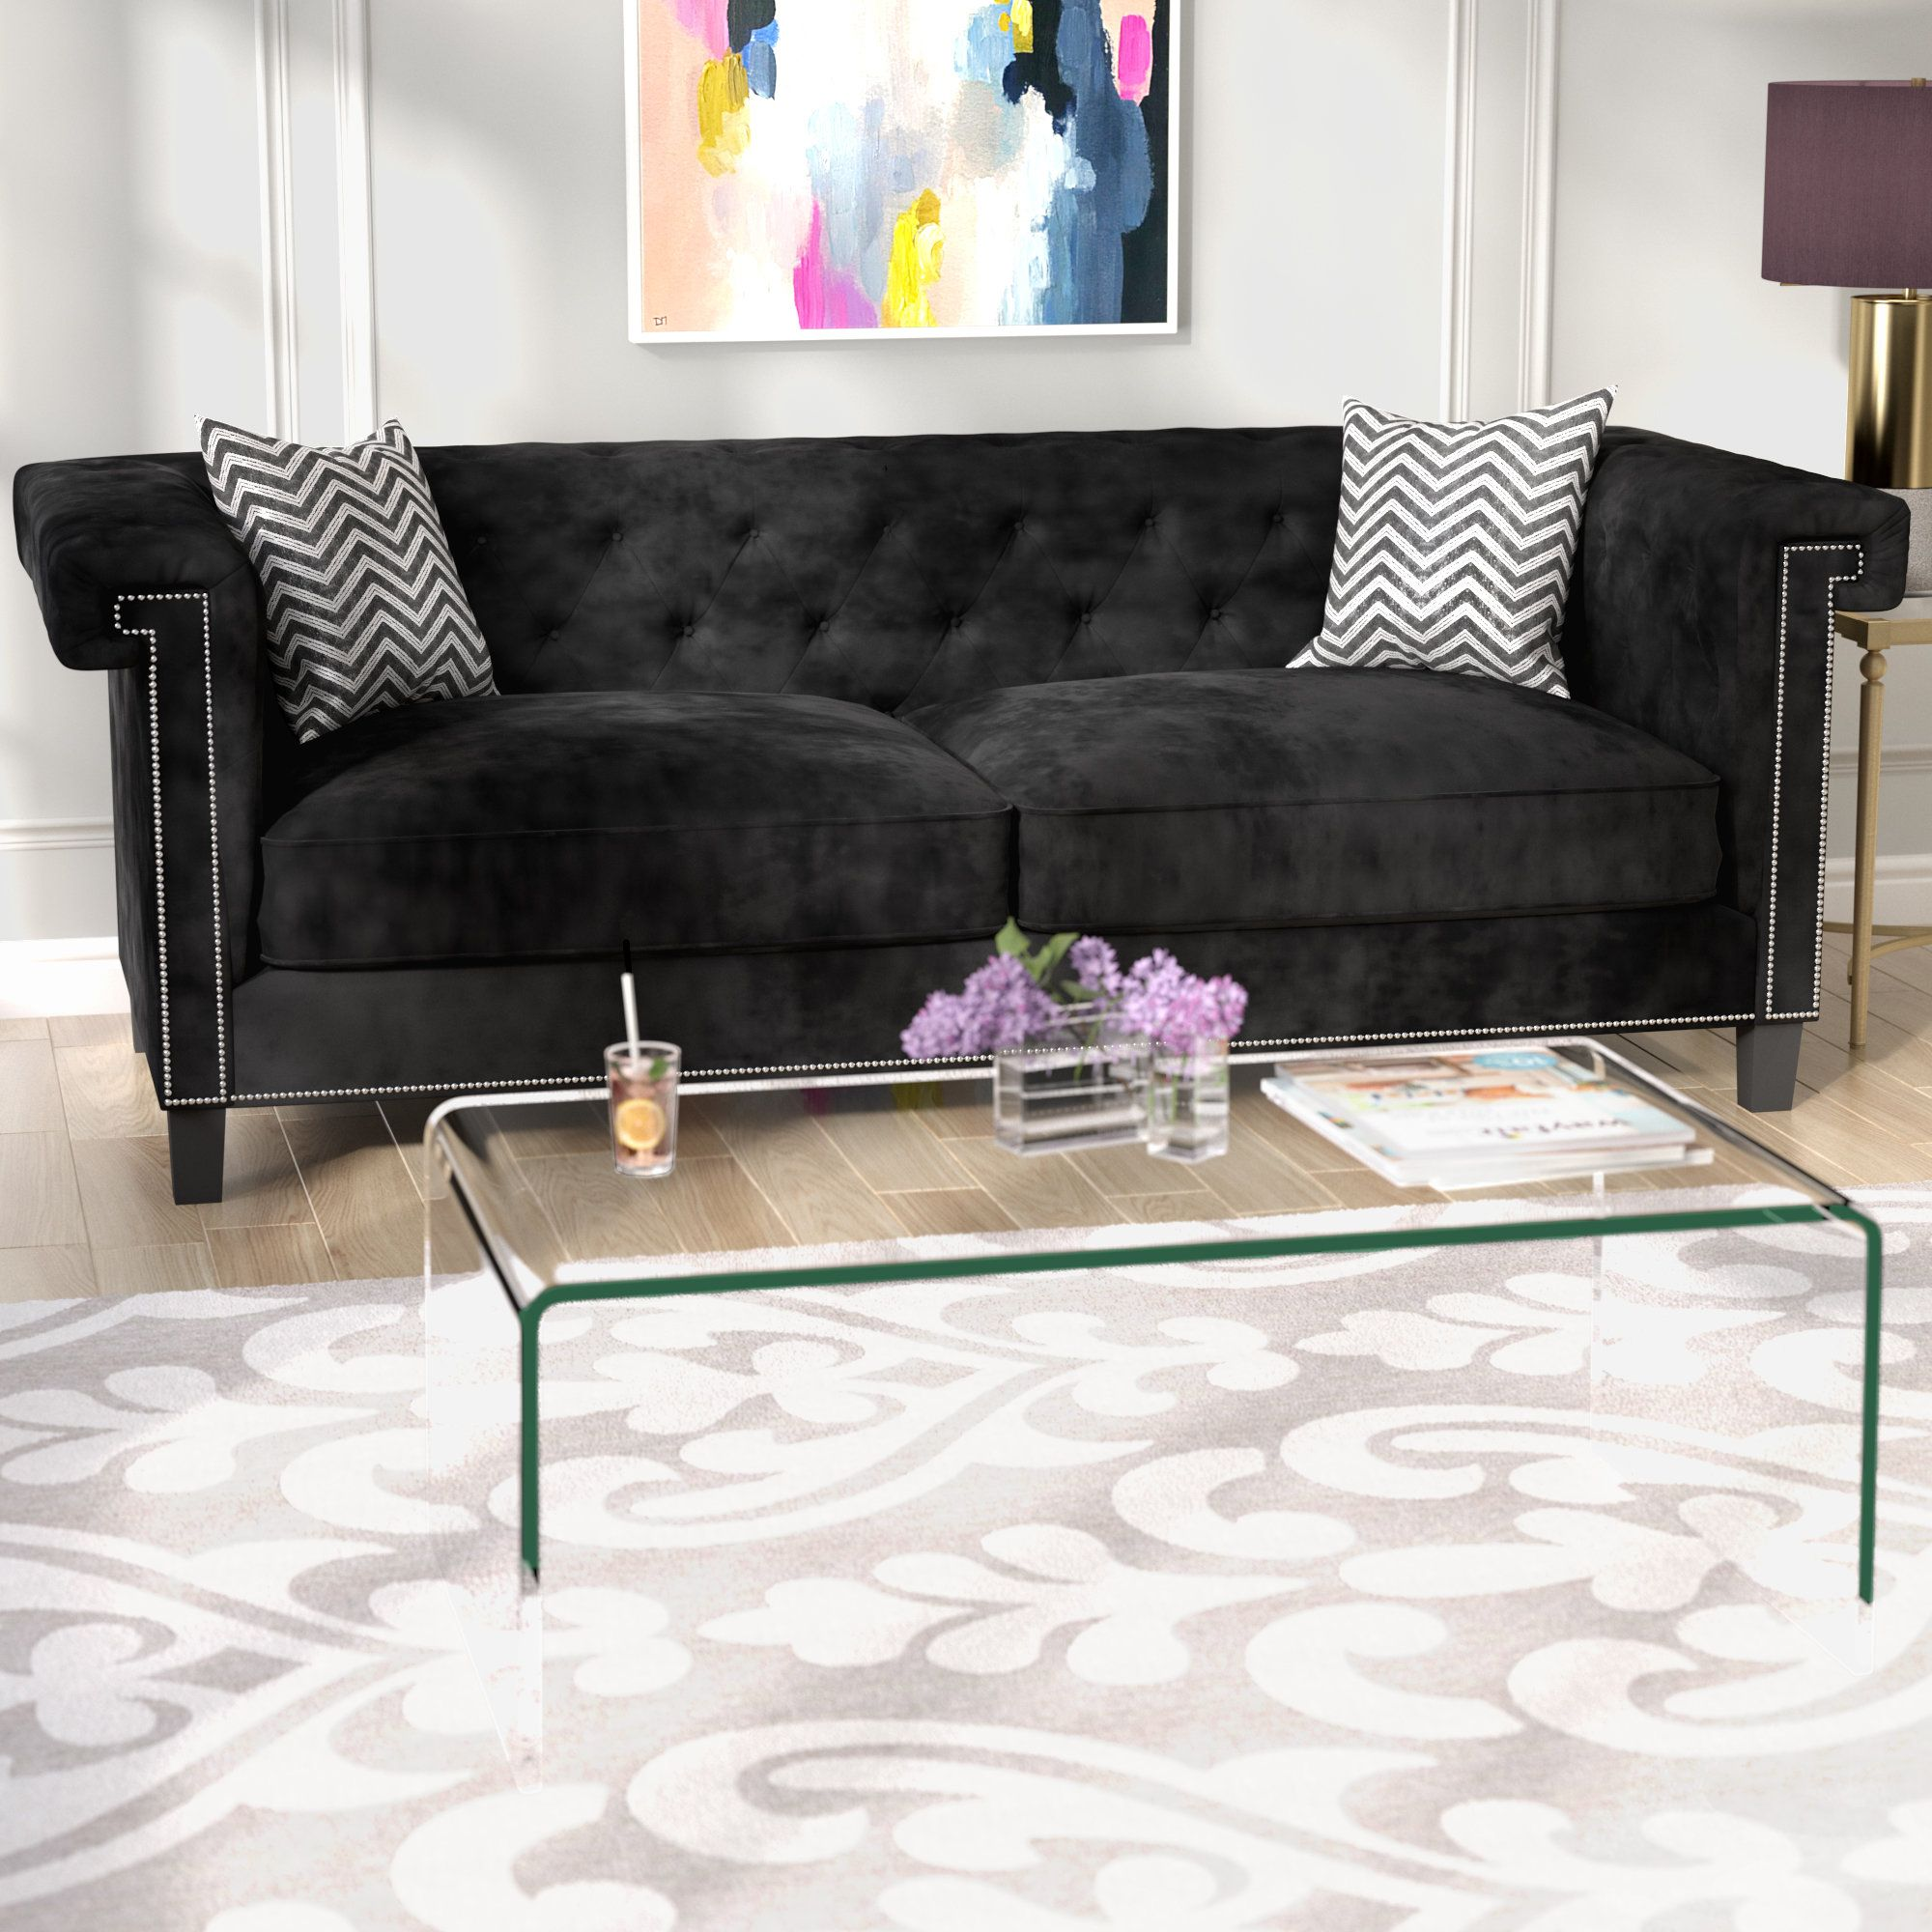 Bett Back Design Stuhl Stile Küche Stühle Uk Mitchell Gold